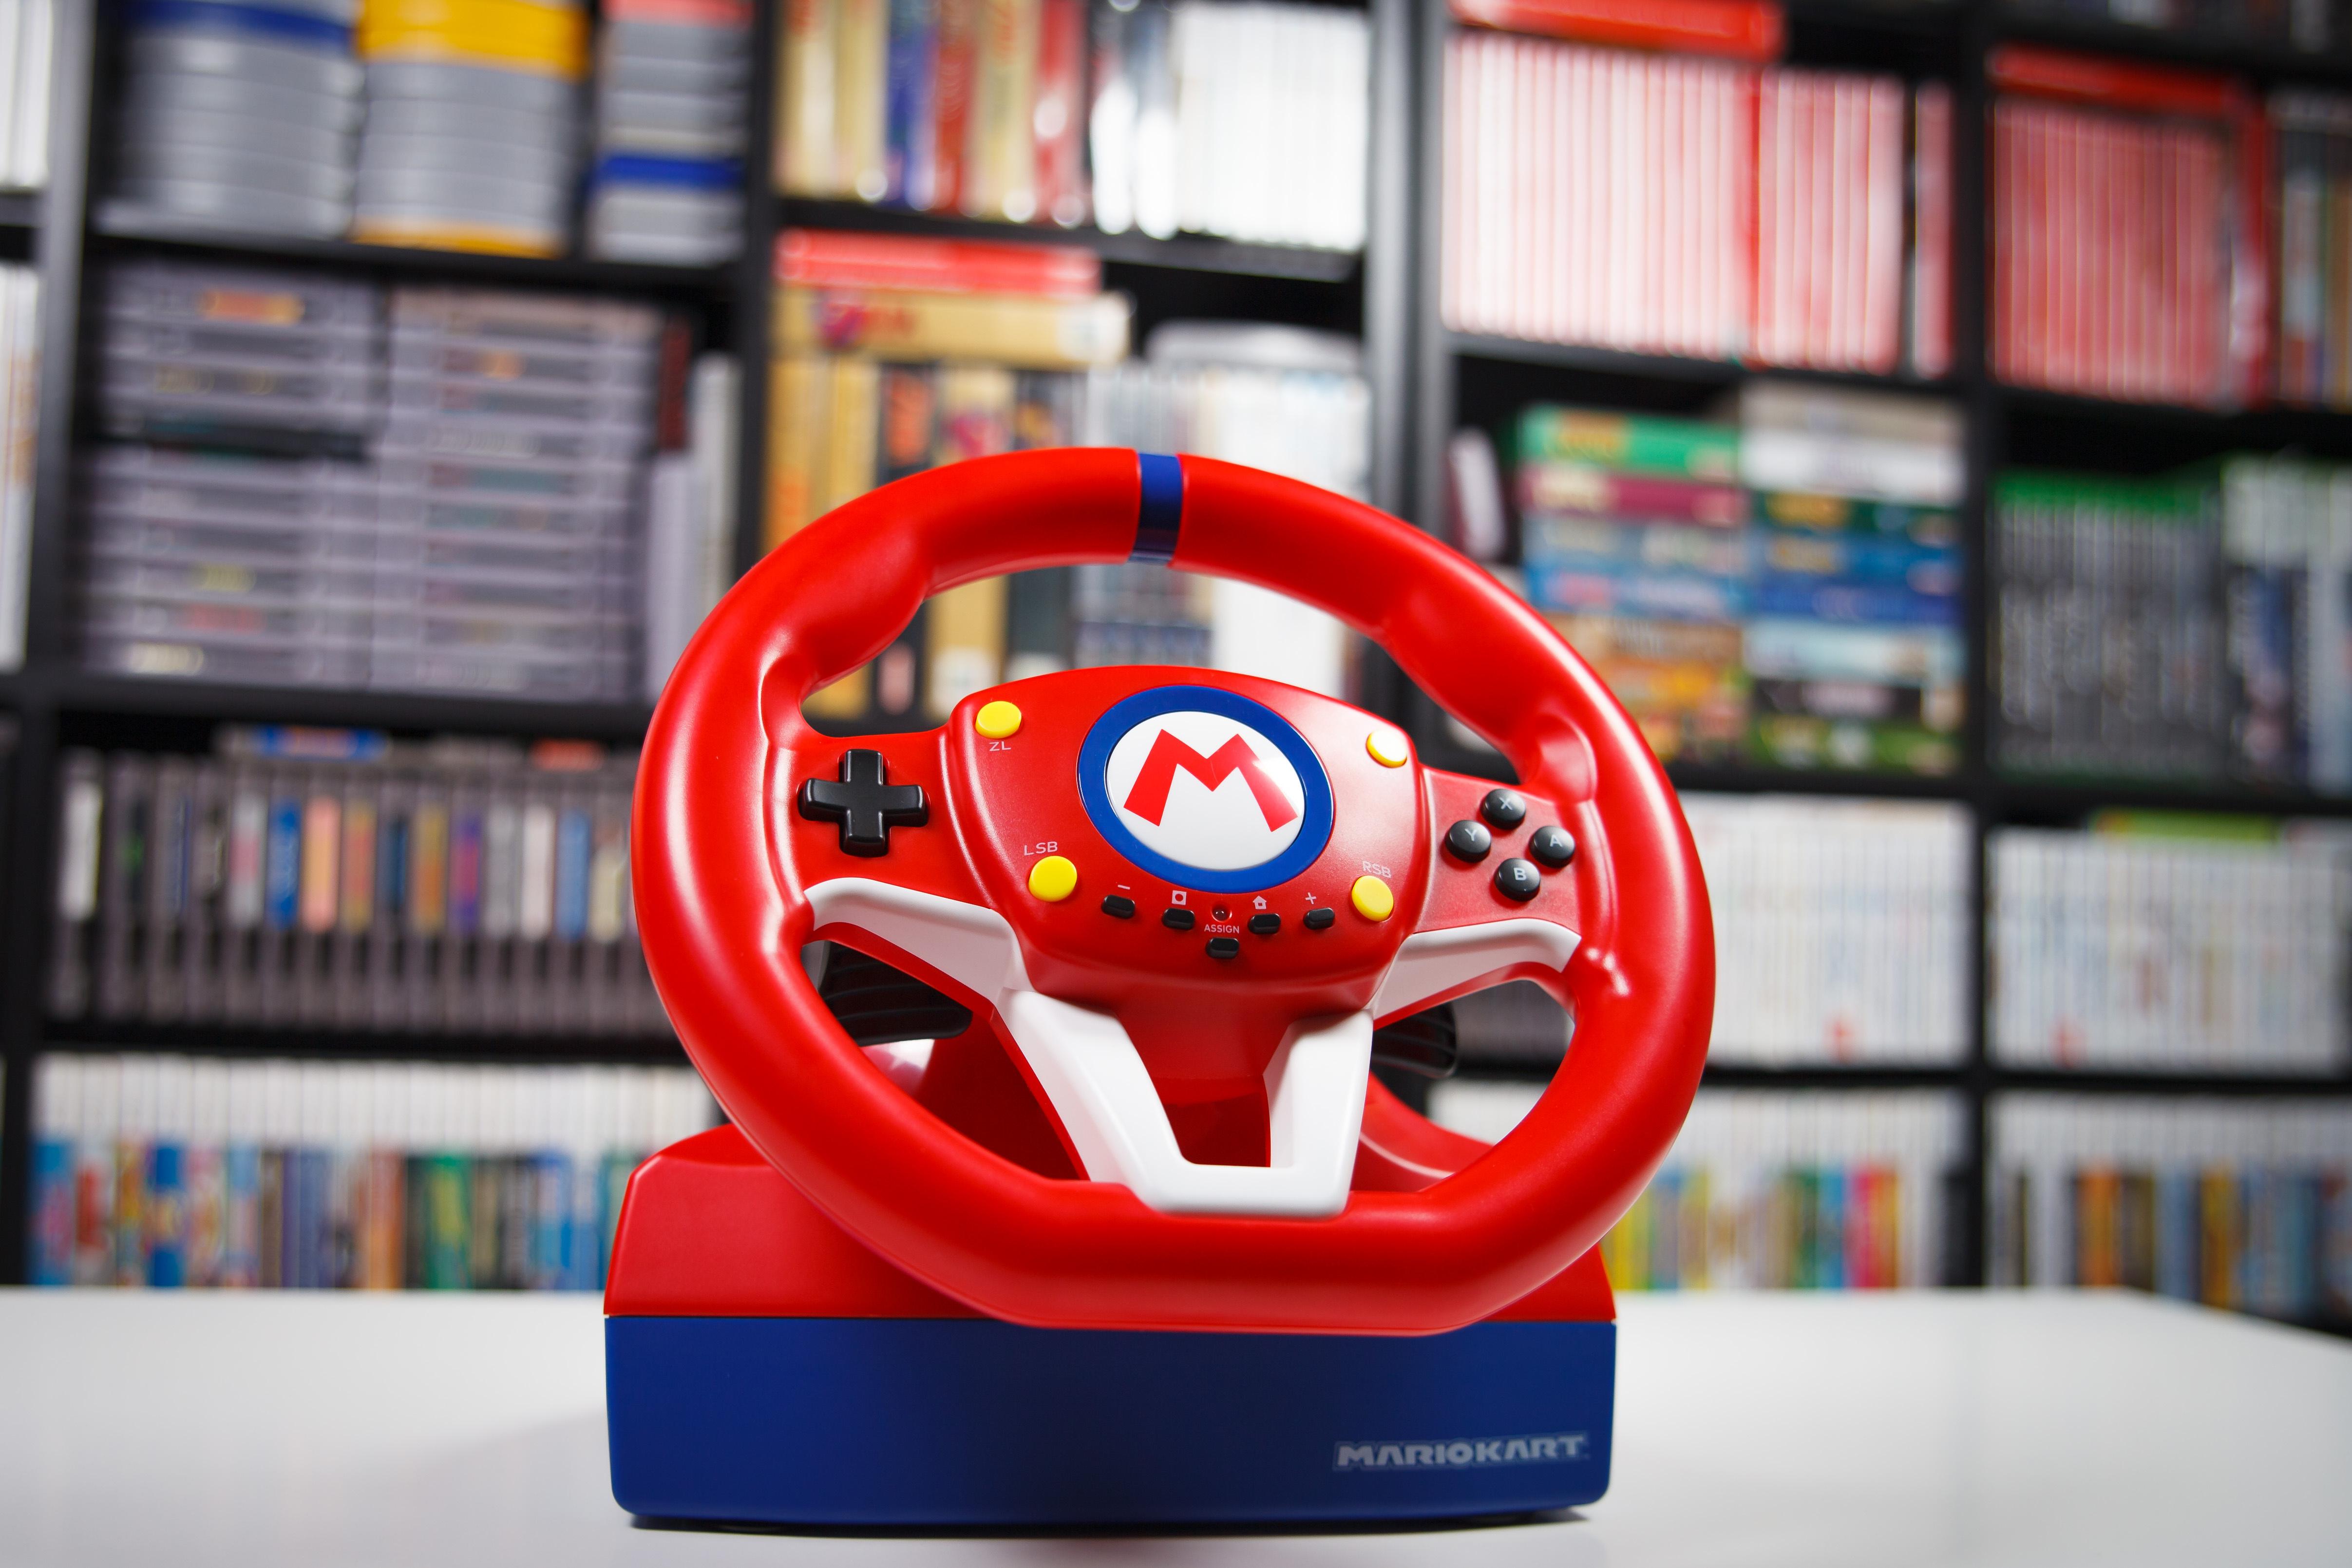 Hardware Review Race Away With Mario Kart Pro Mini Deluxe Racing Wheels Nintendo Life